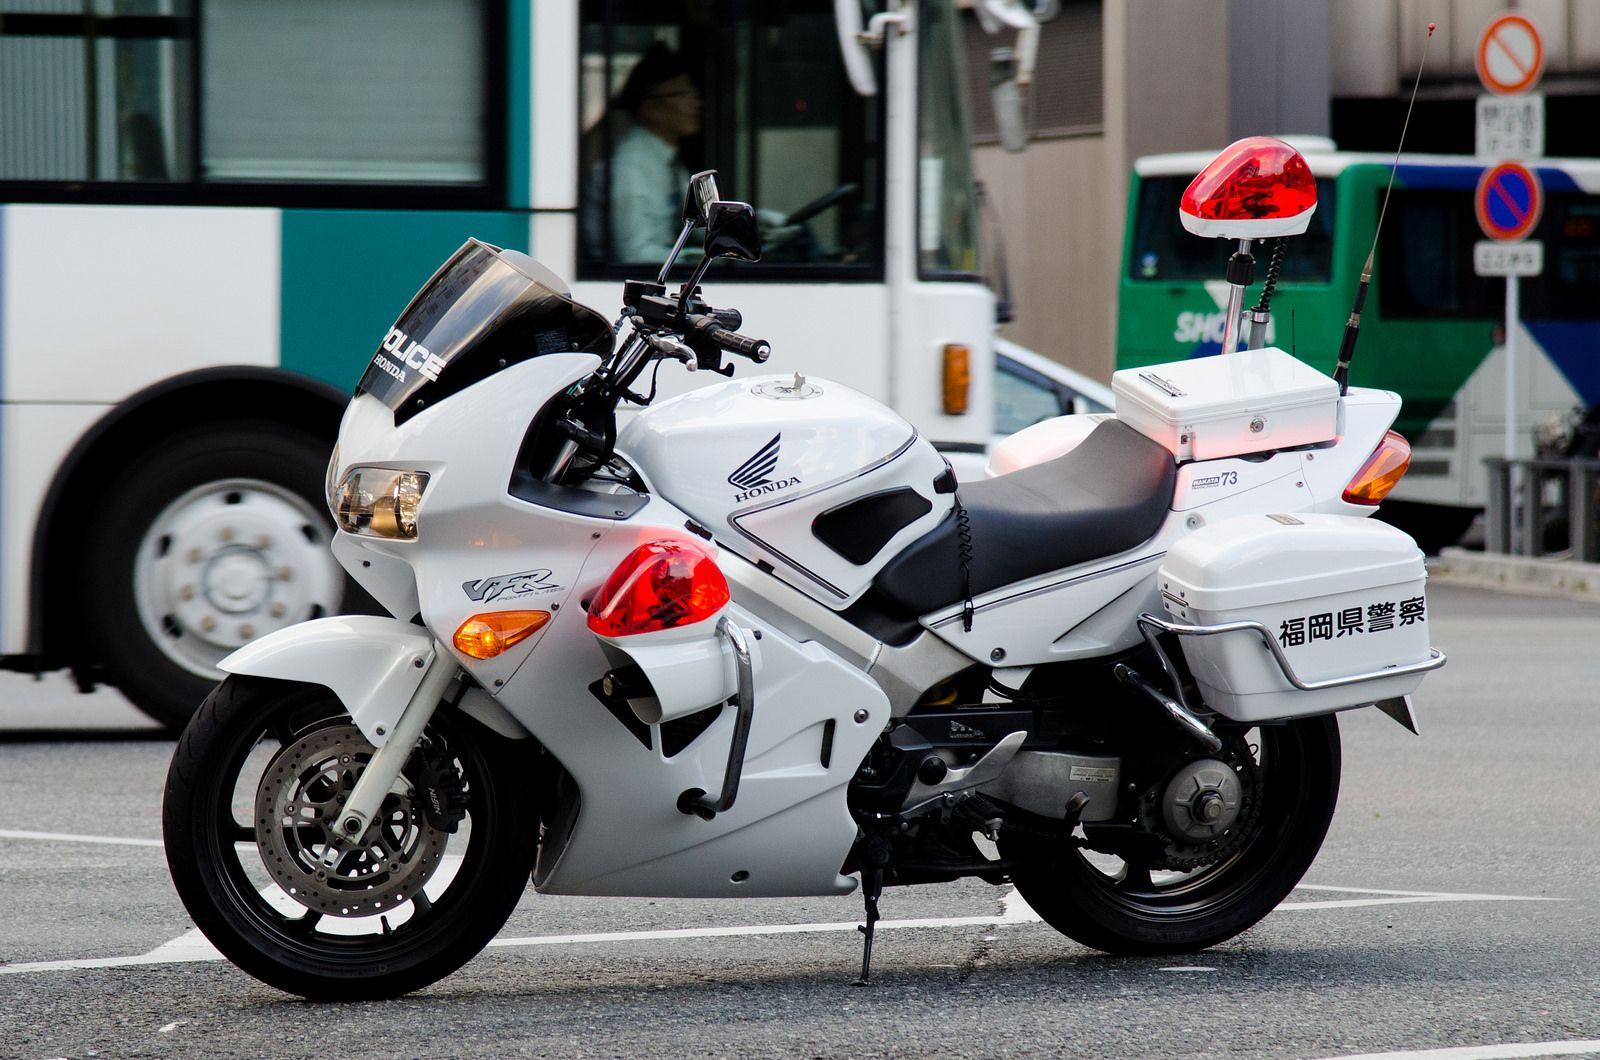 Honda Vfr Police Motorcycle Honda Vfr Police Motorcycle